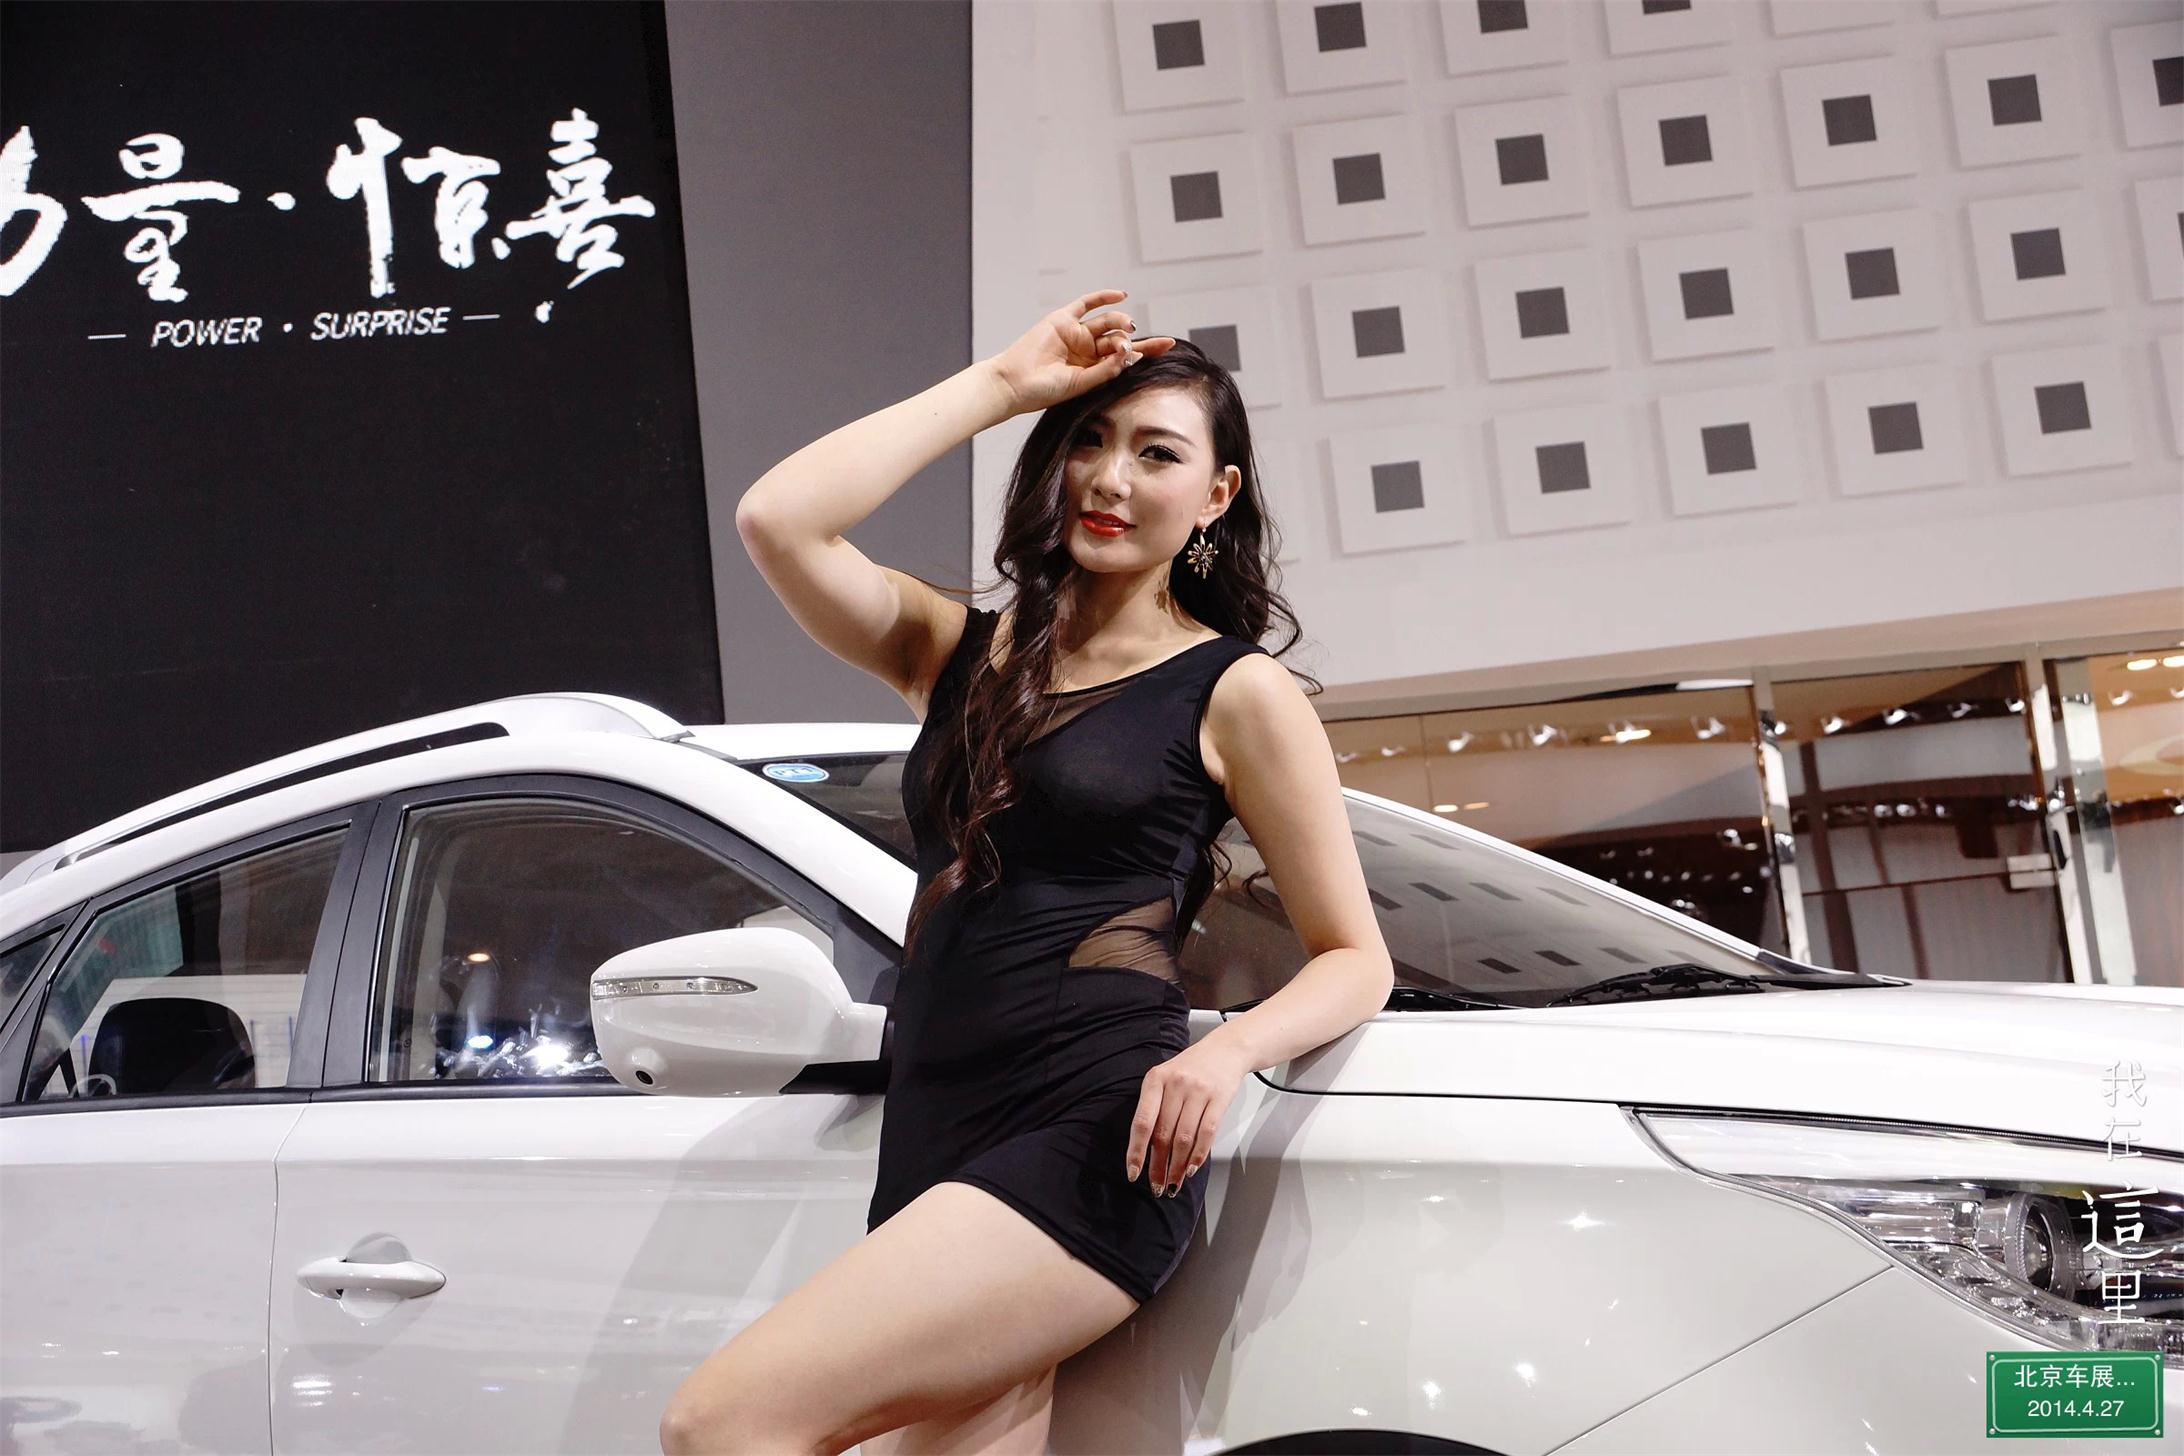 a77拍摄北京车展特写模特镜头